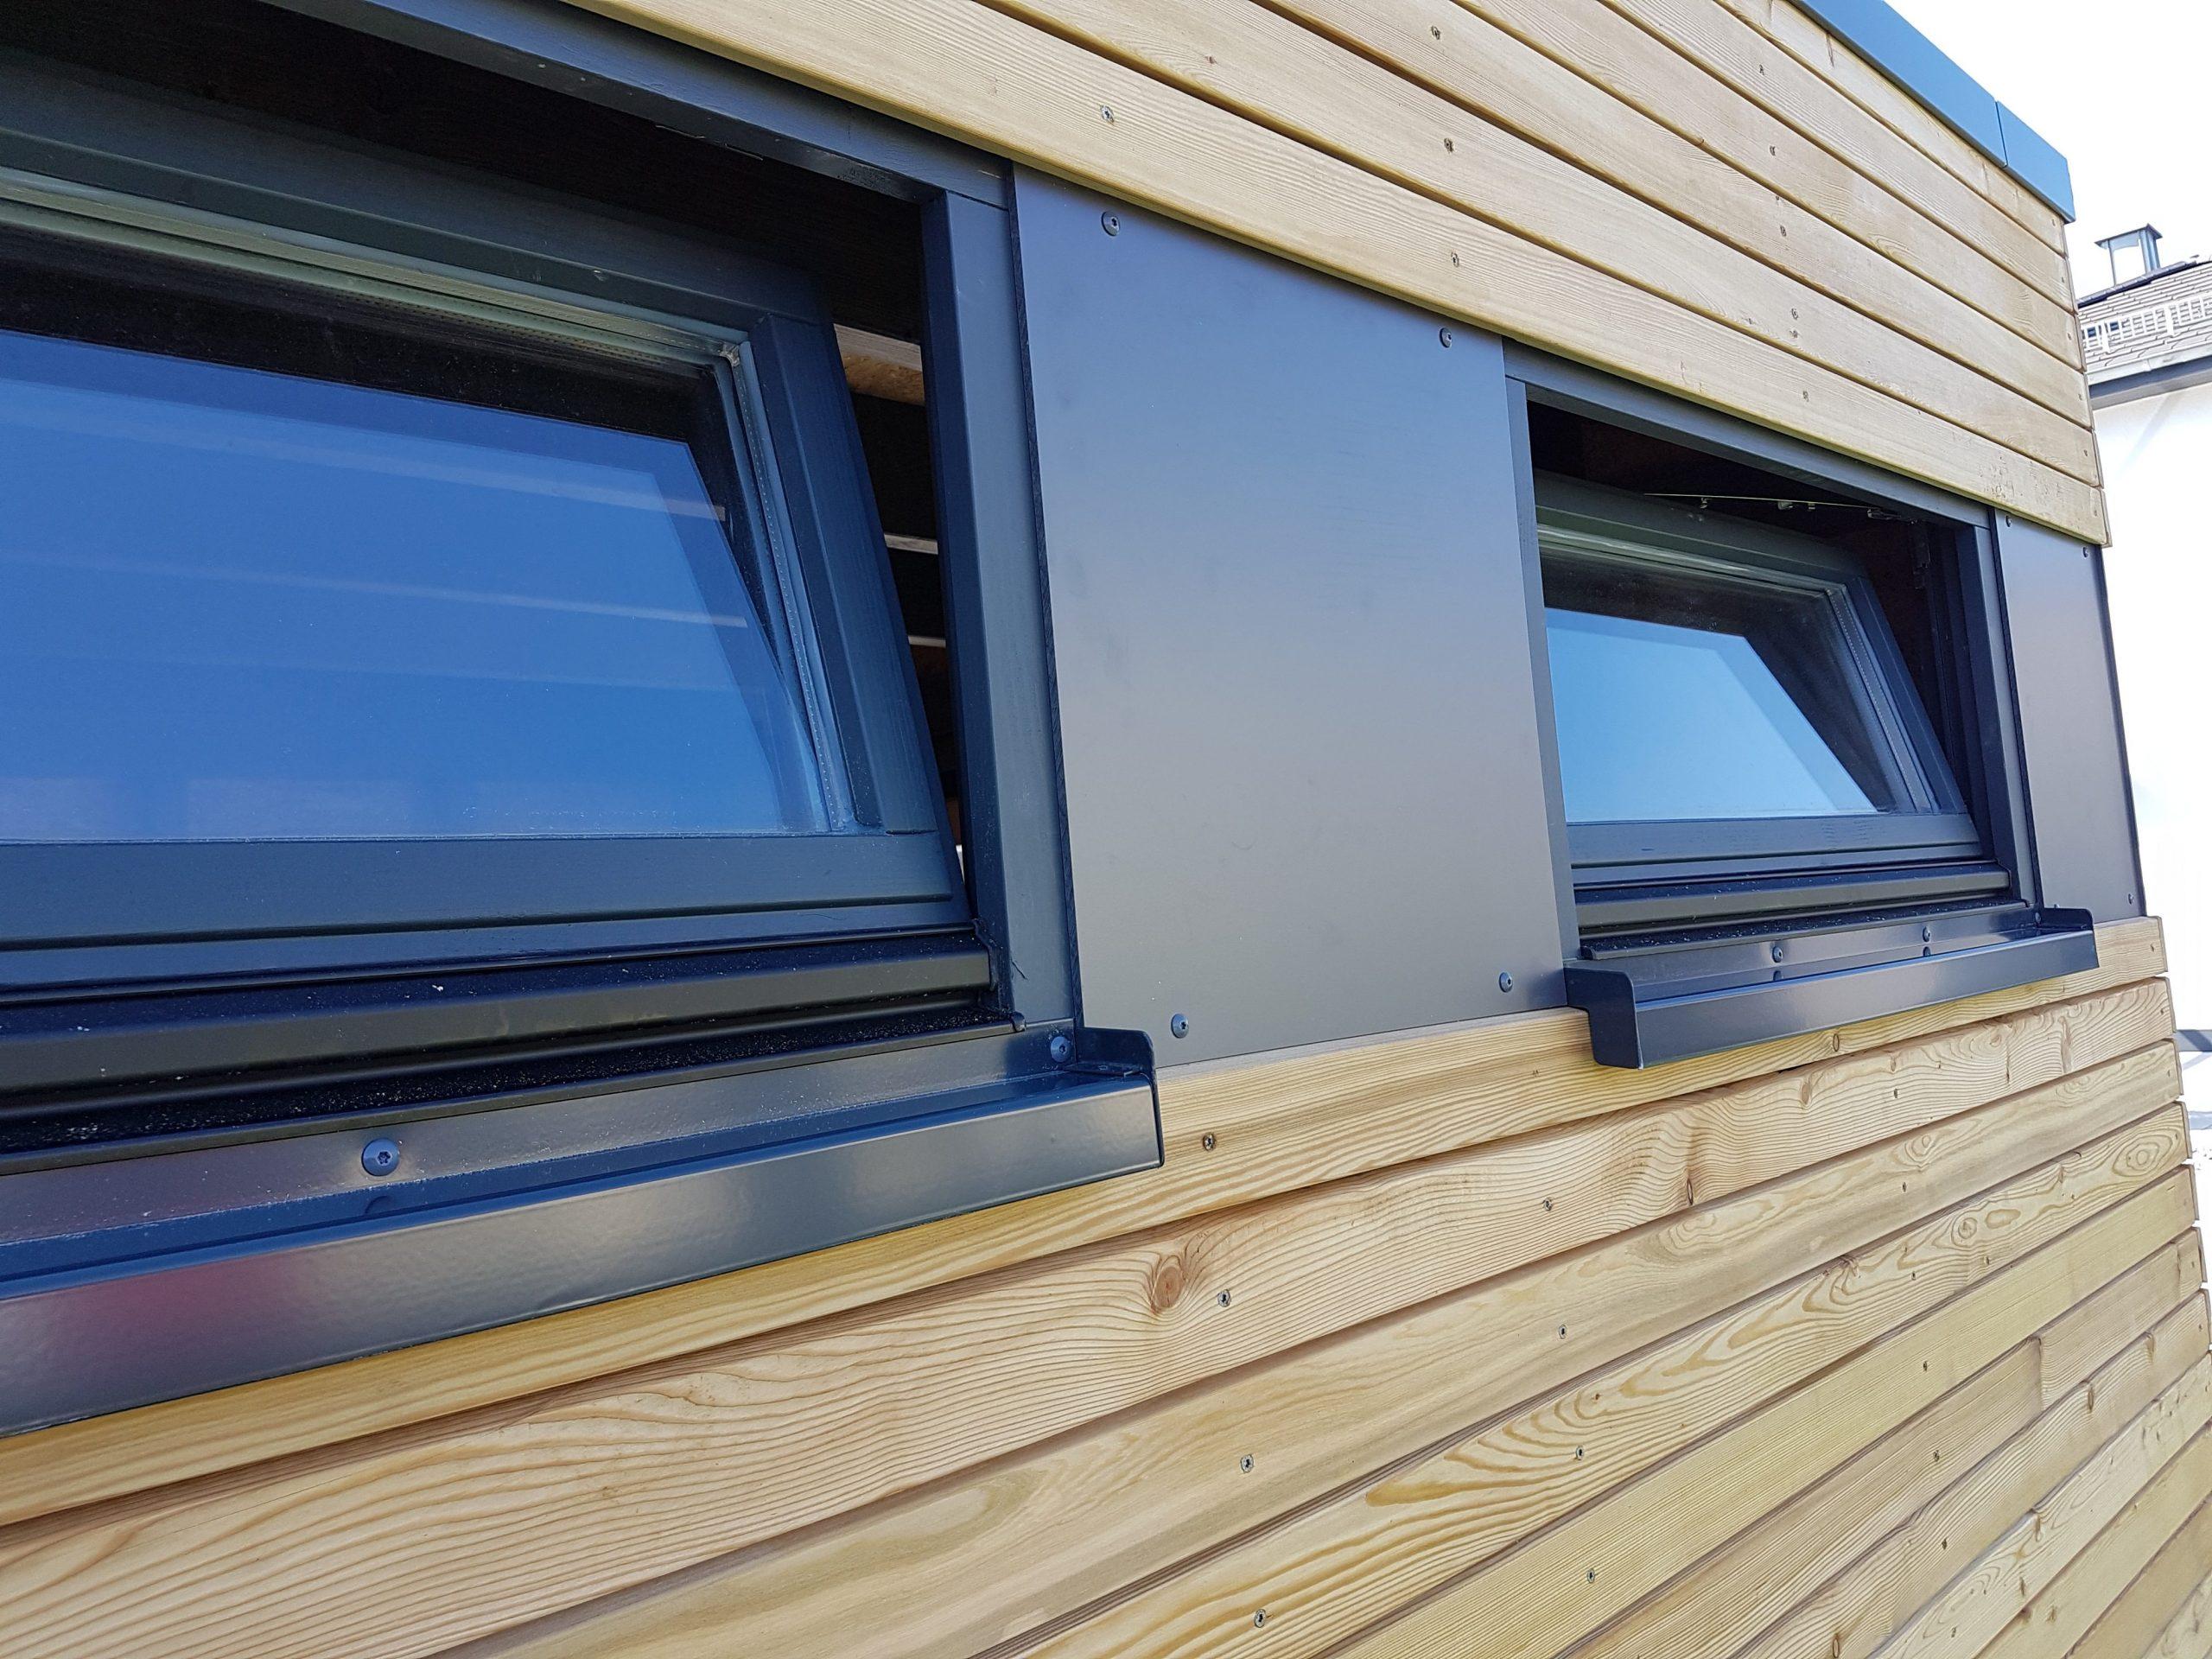 Gartenhaus, Blockcube, Detail, Fenster